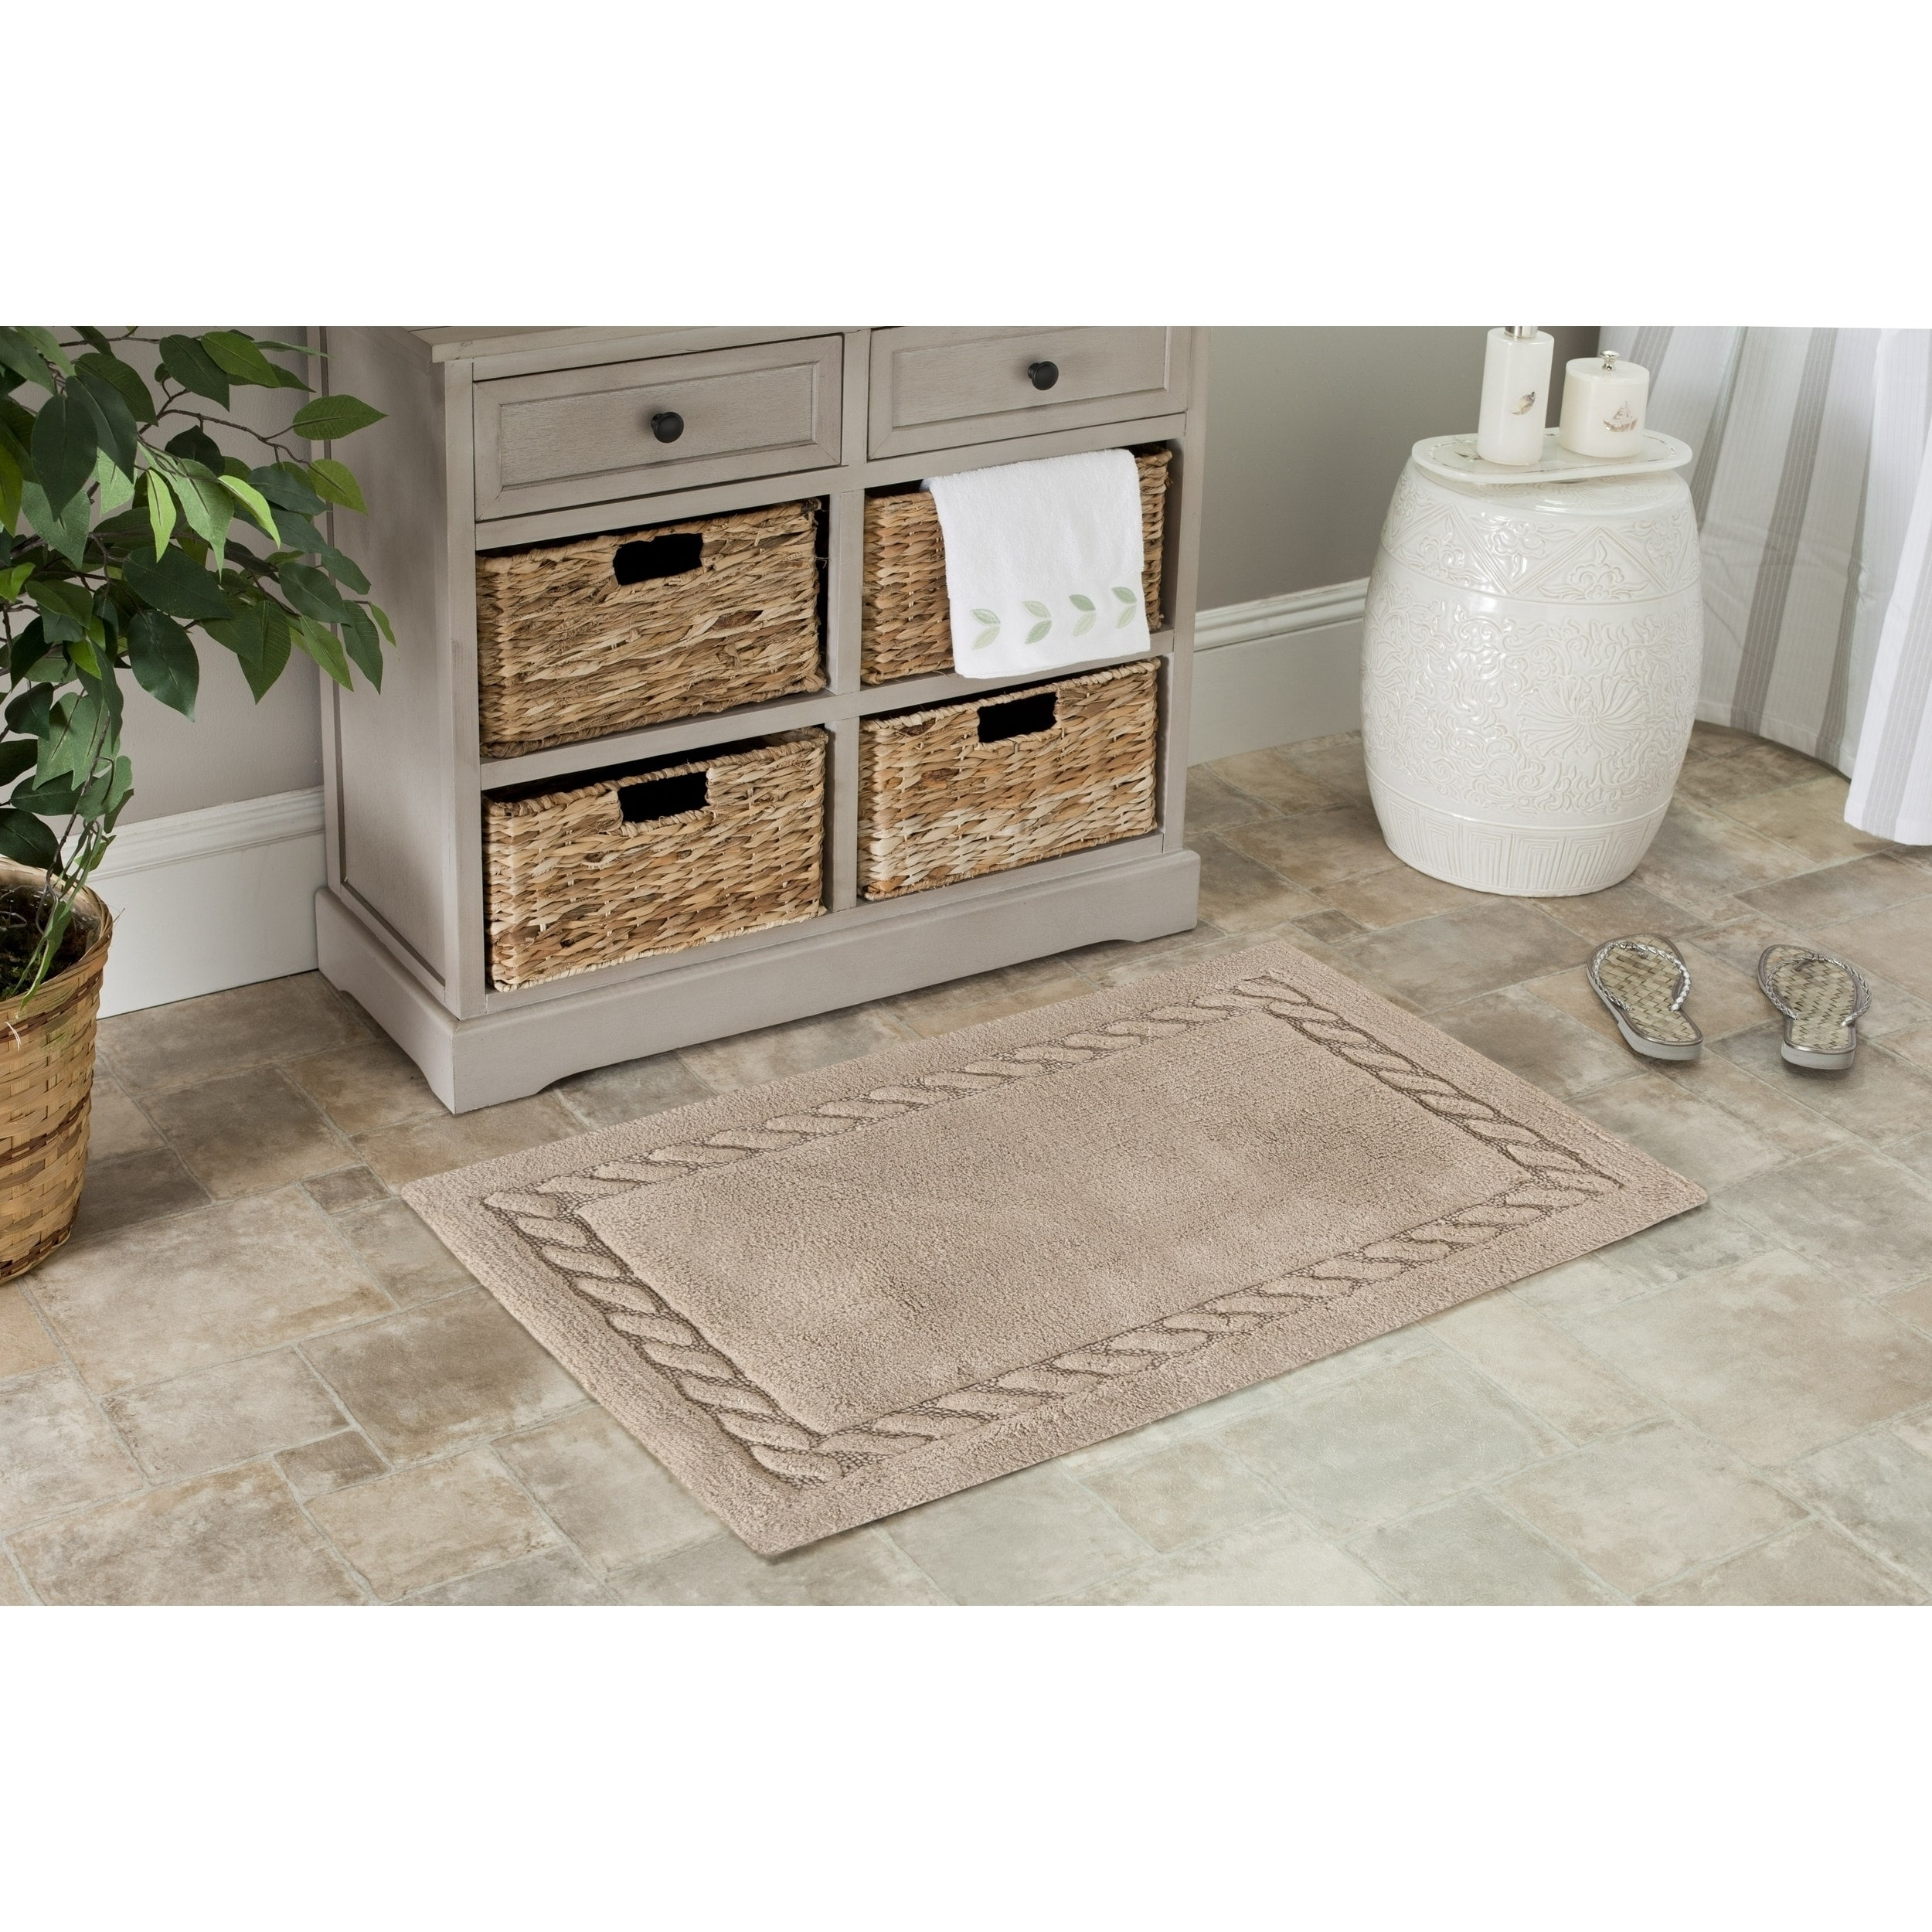 Safavieh Plush Master Cable Plush Linen Bath Rug (Set Of